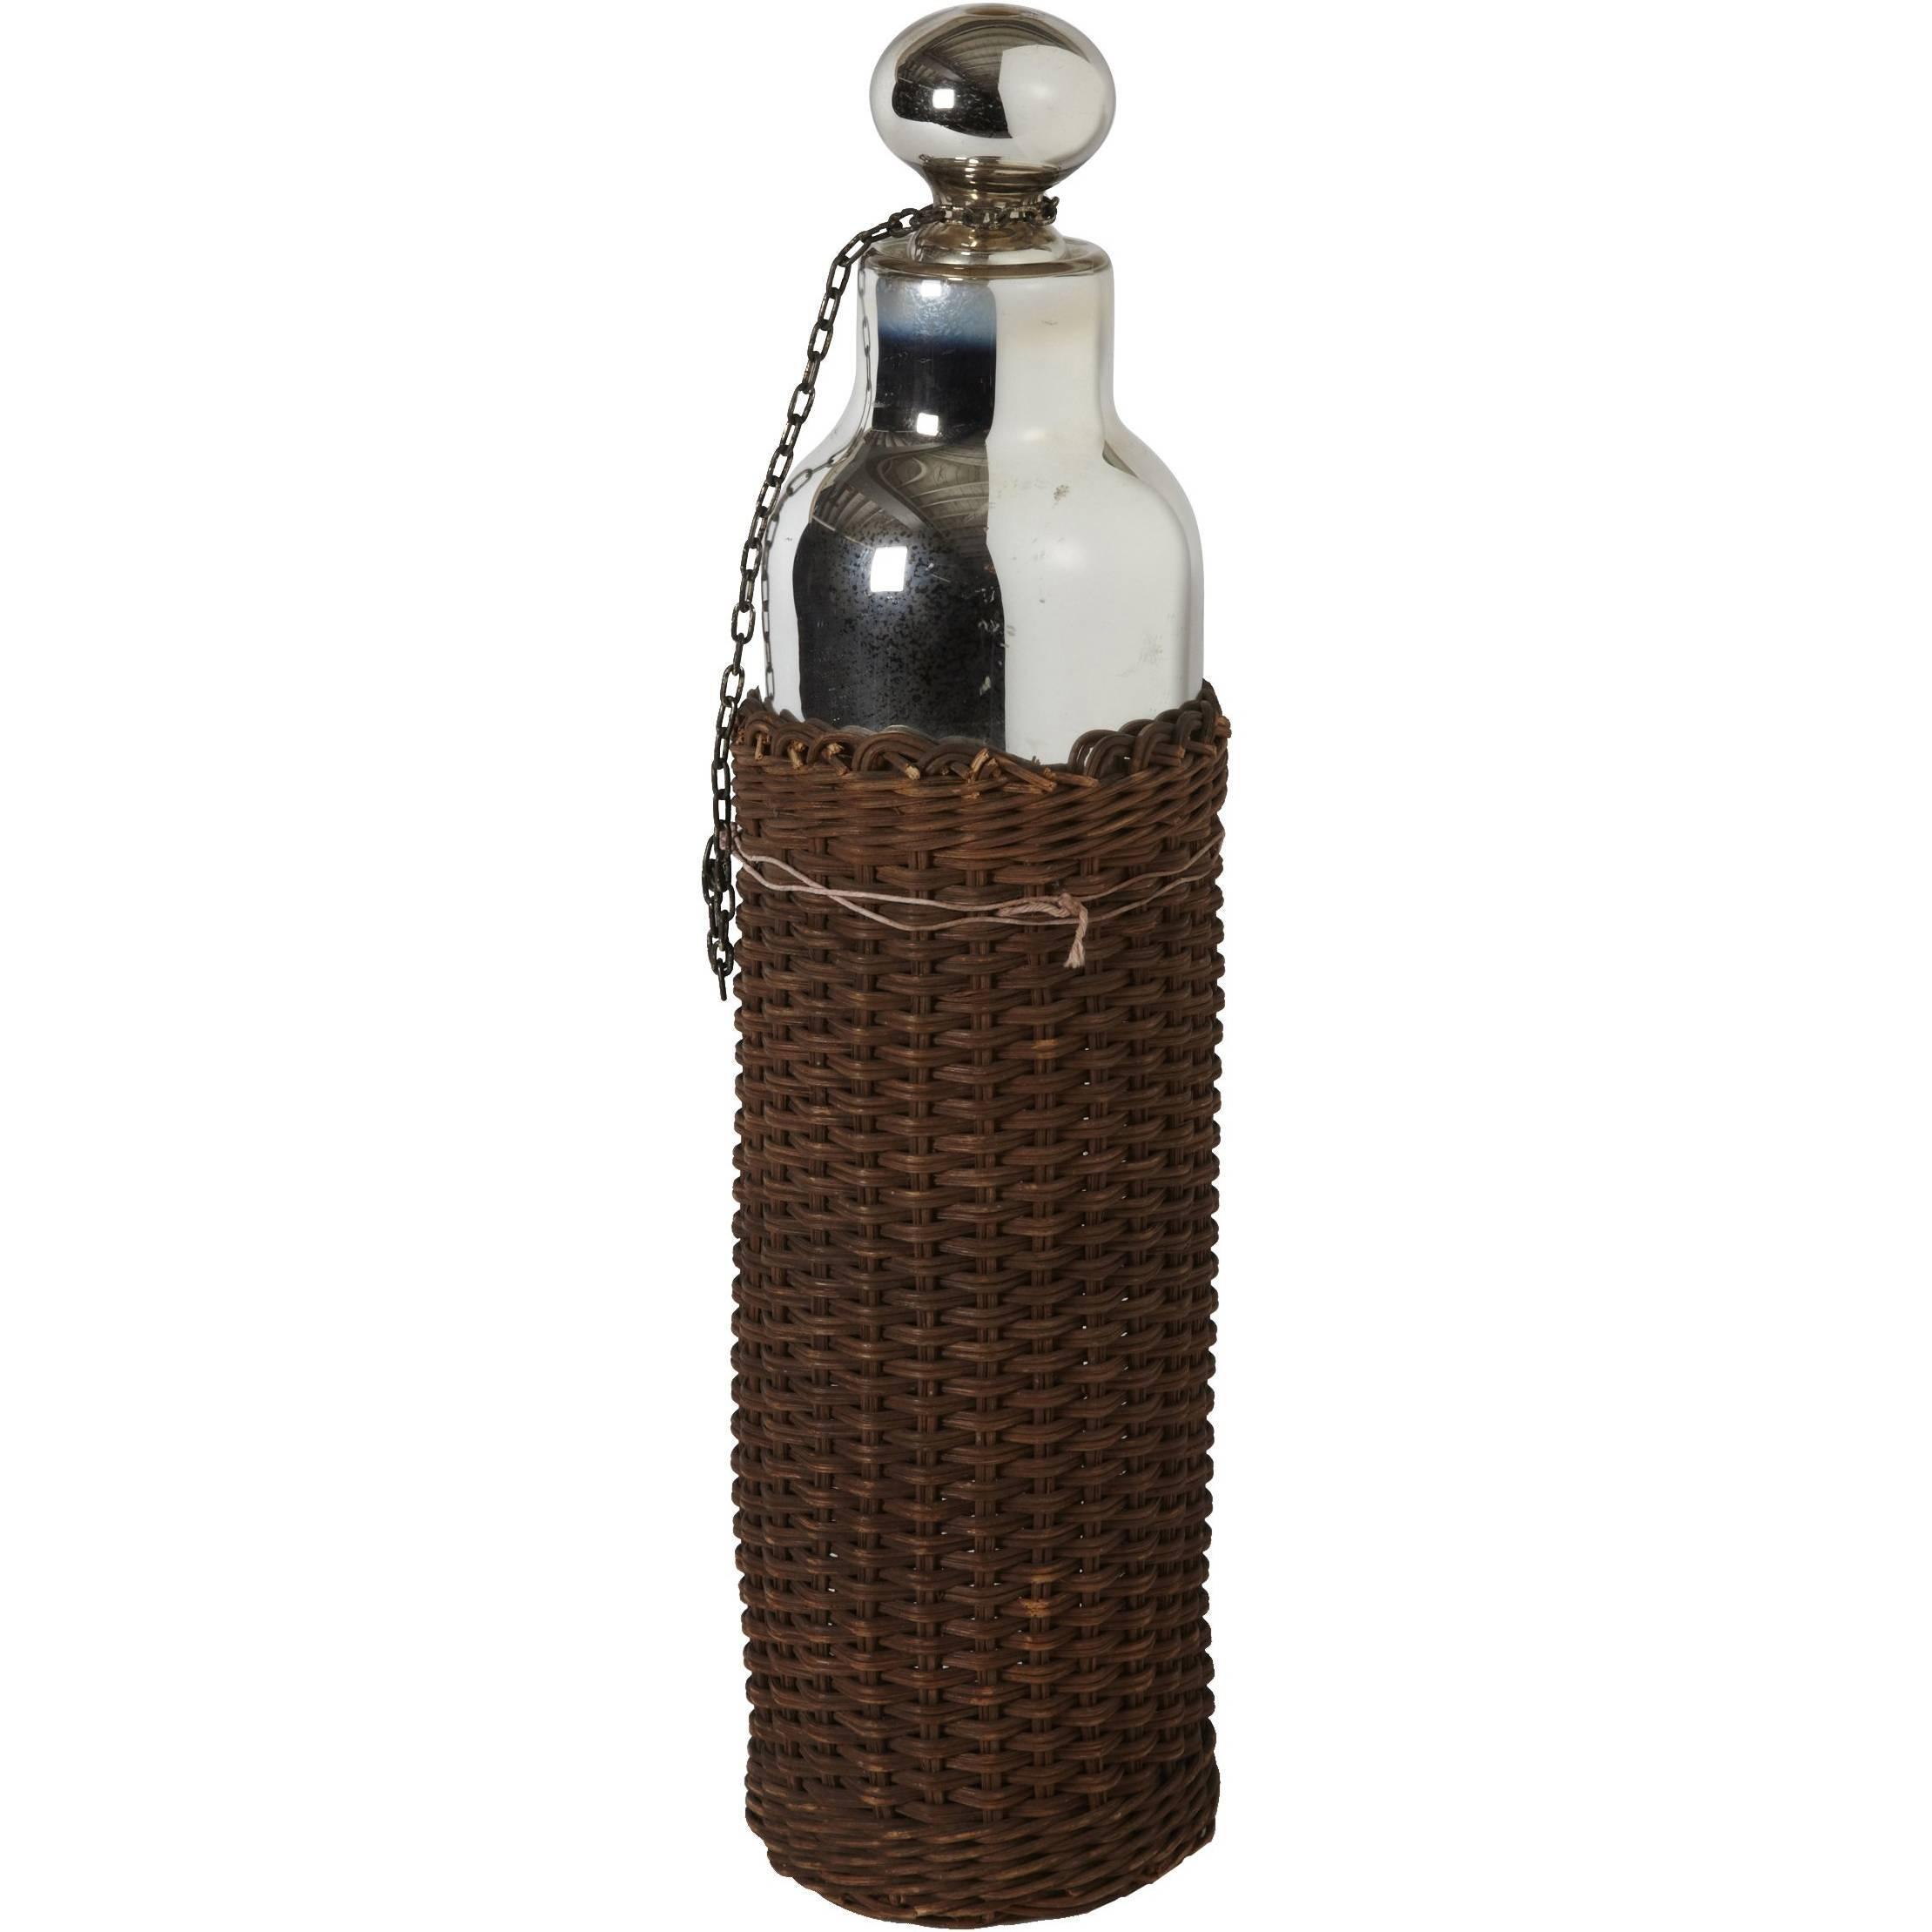 Vintage Wicker Mercury Glass Thermos Bottle